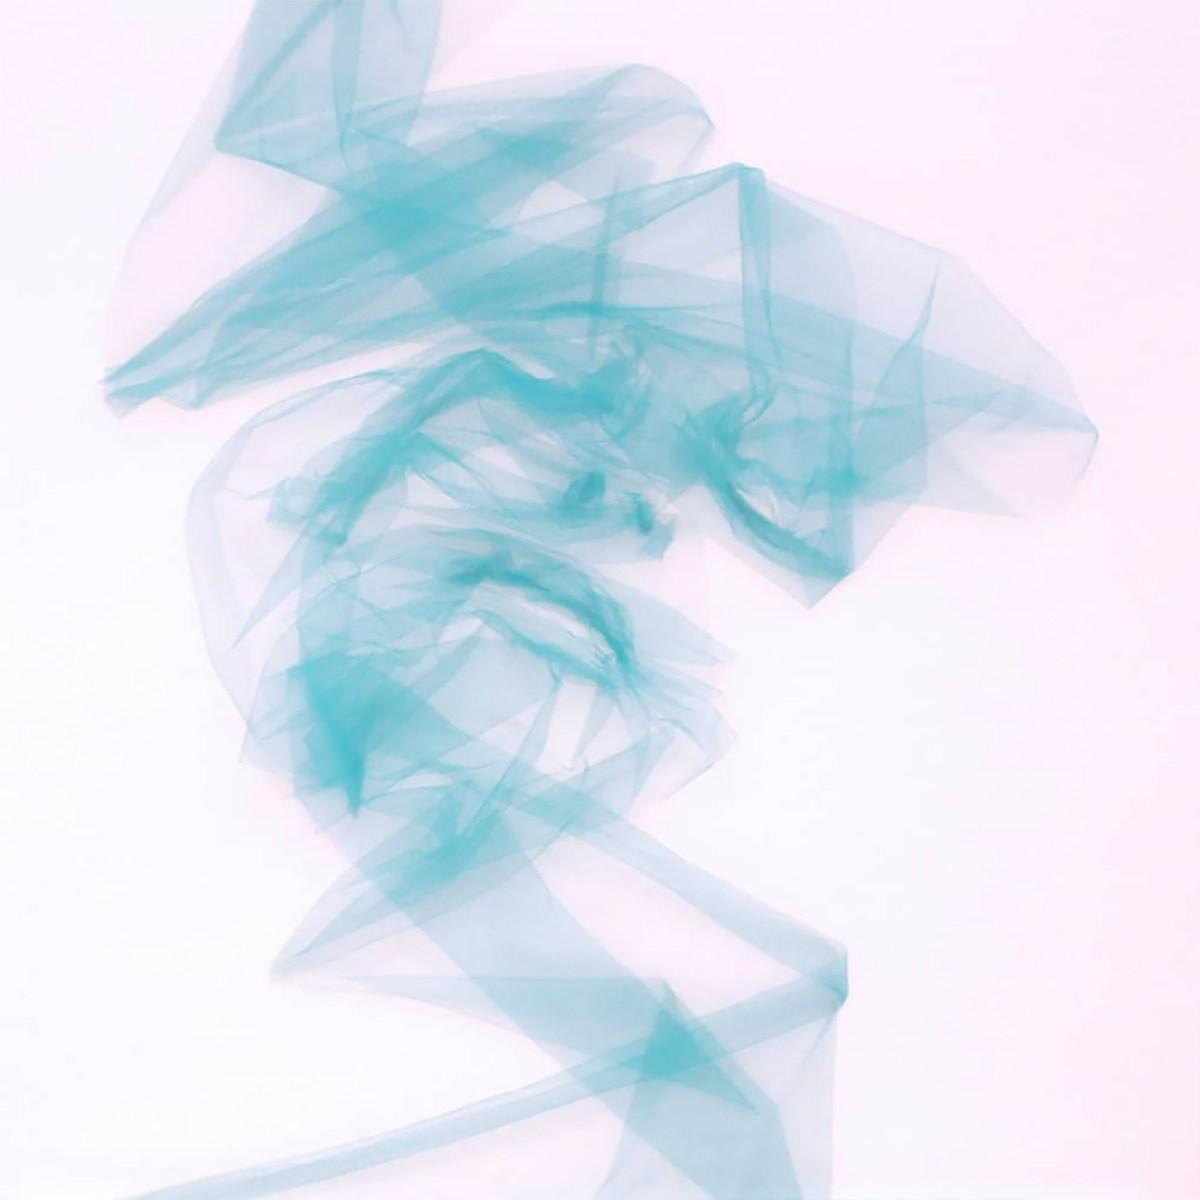 art-benjamin-shine-06